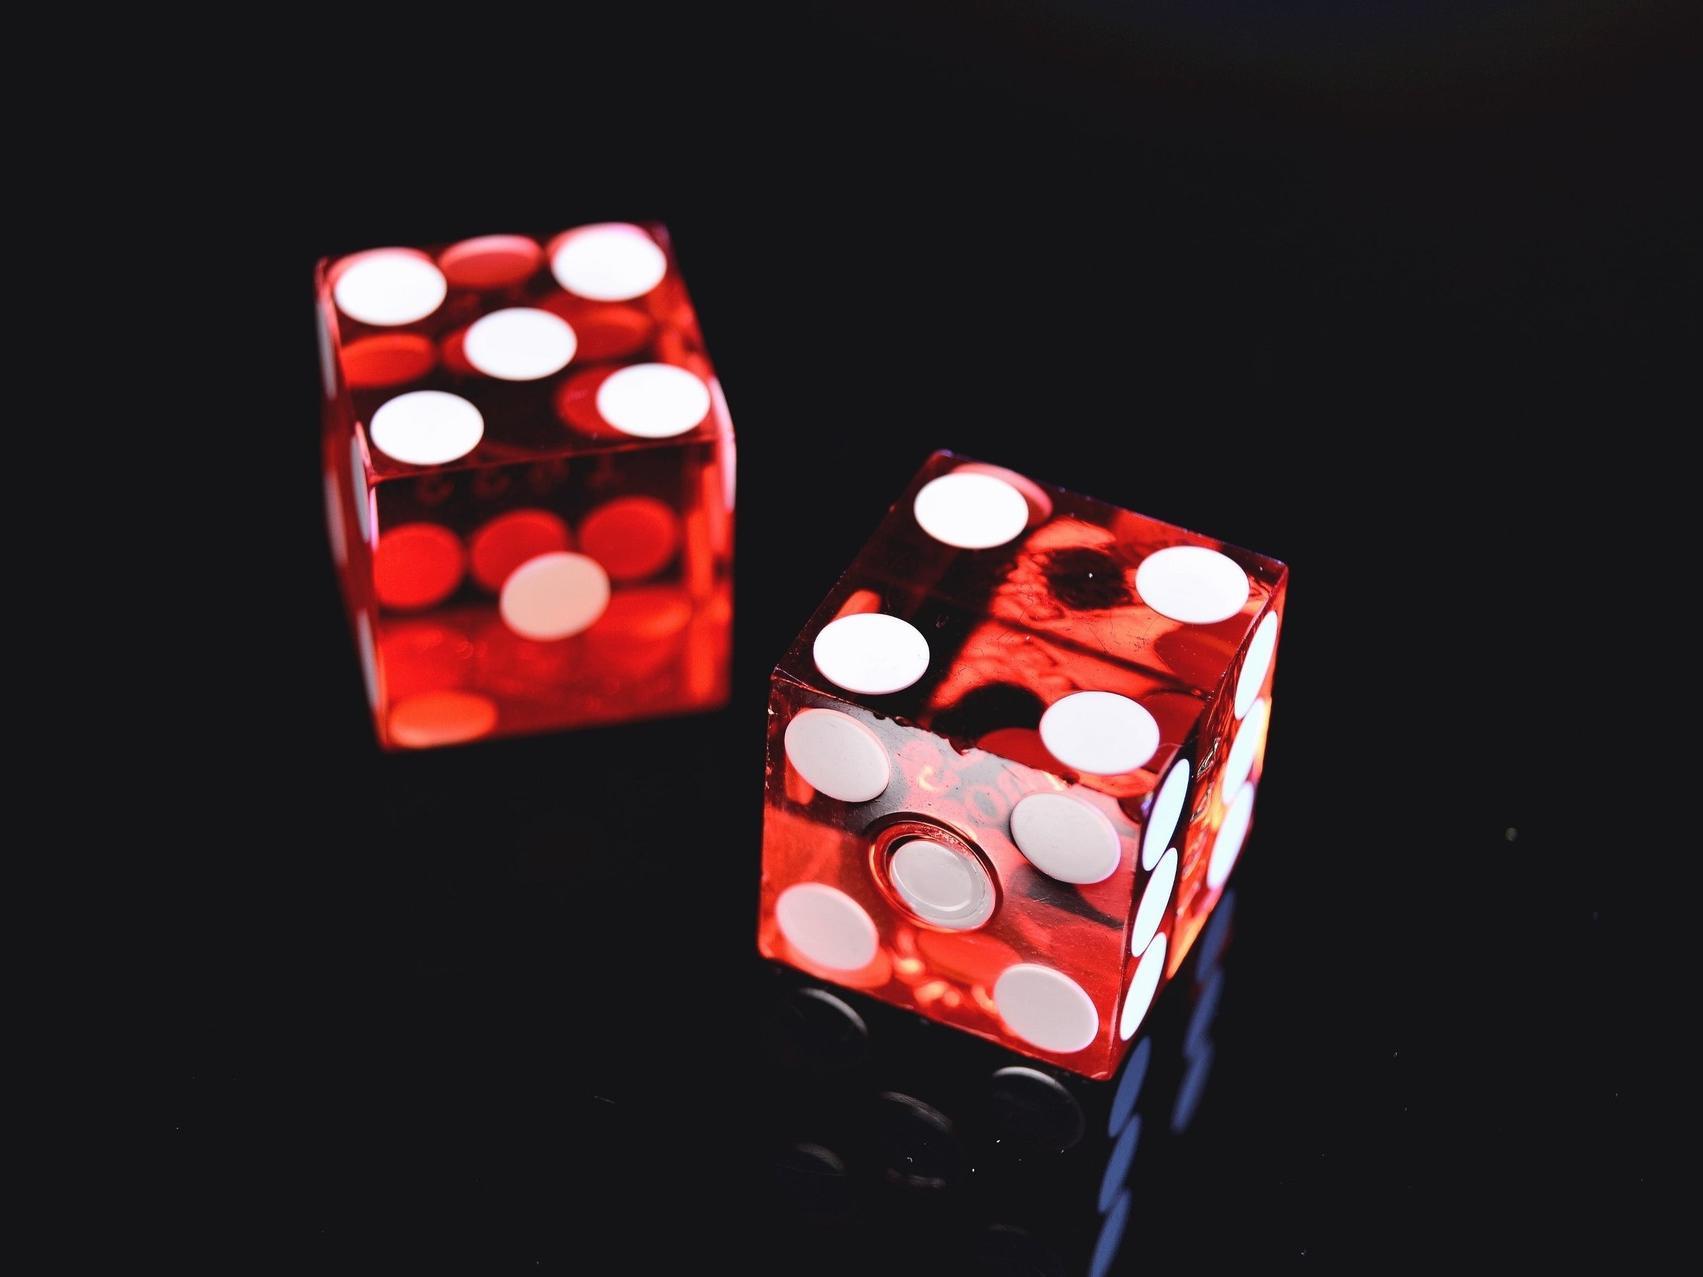 a set of dice